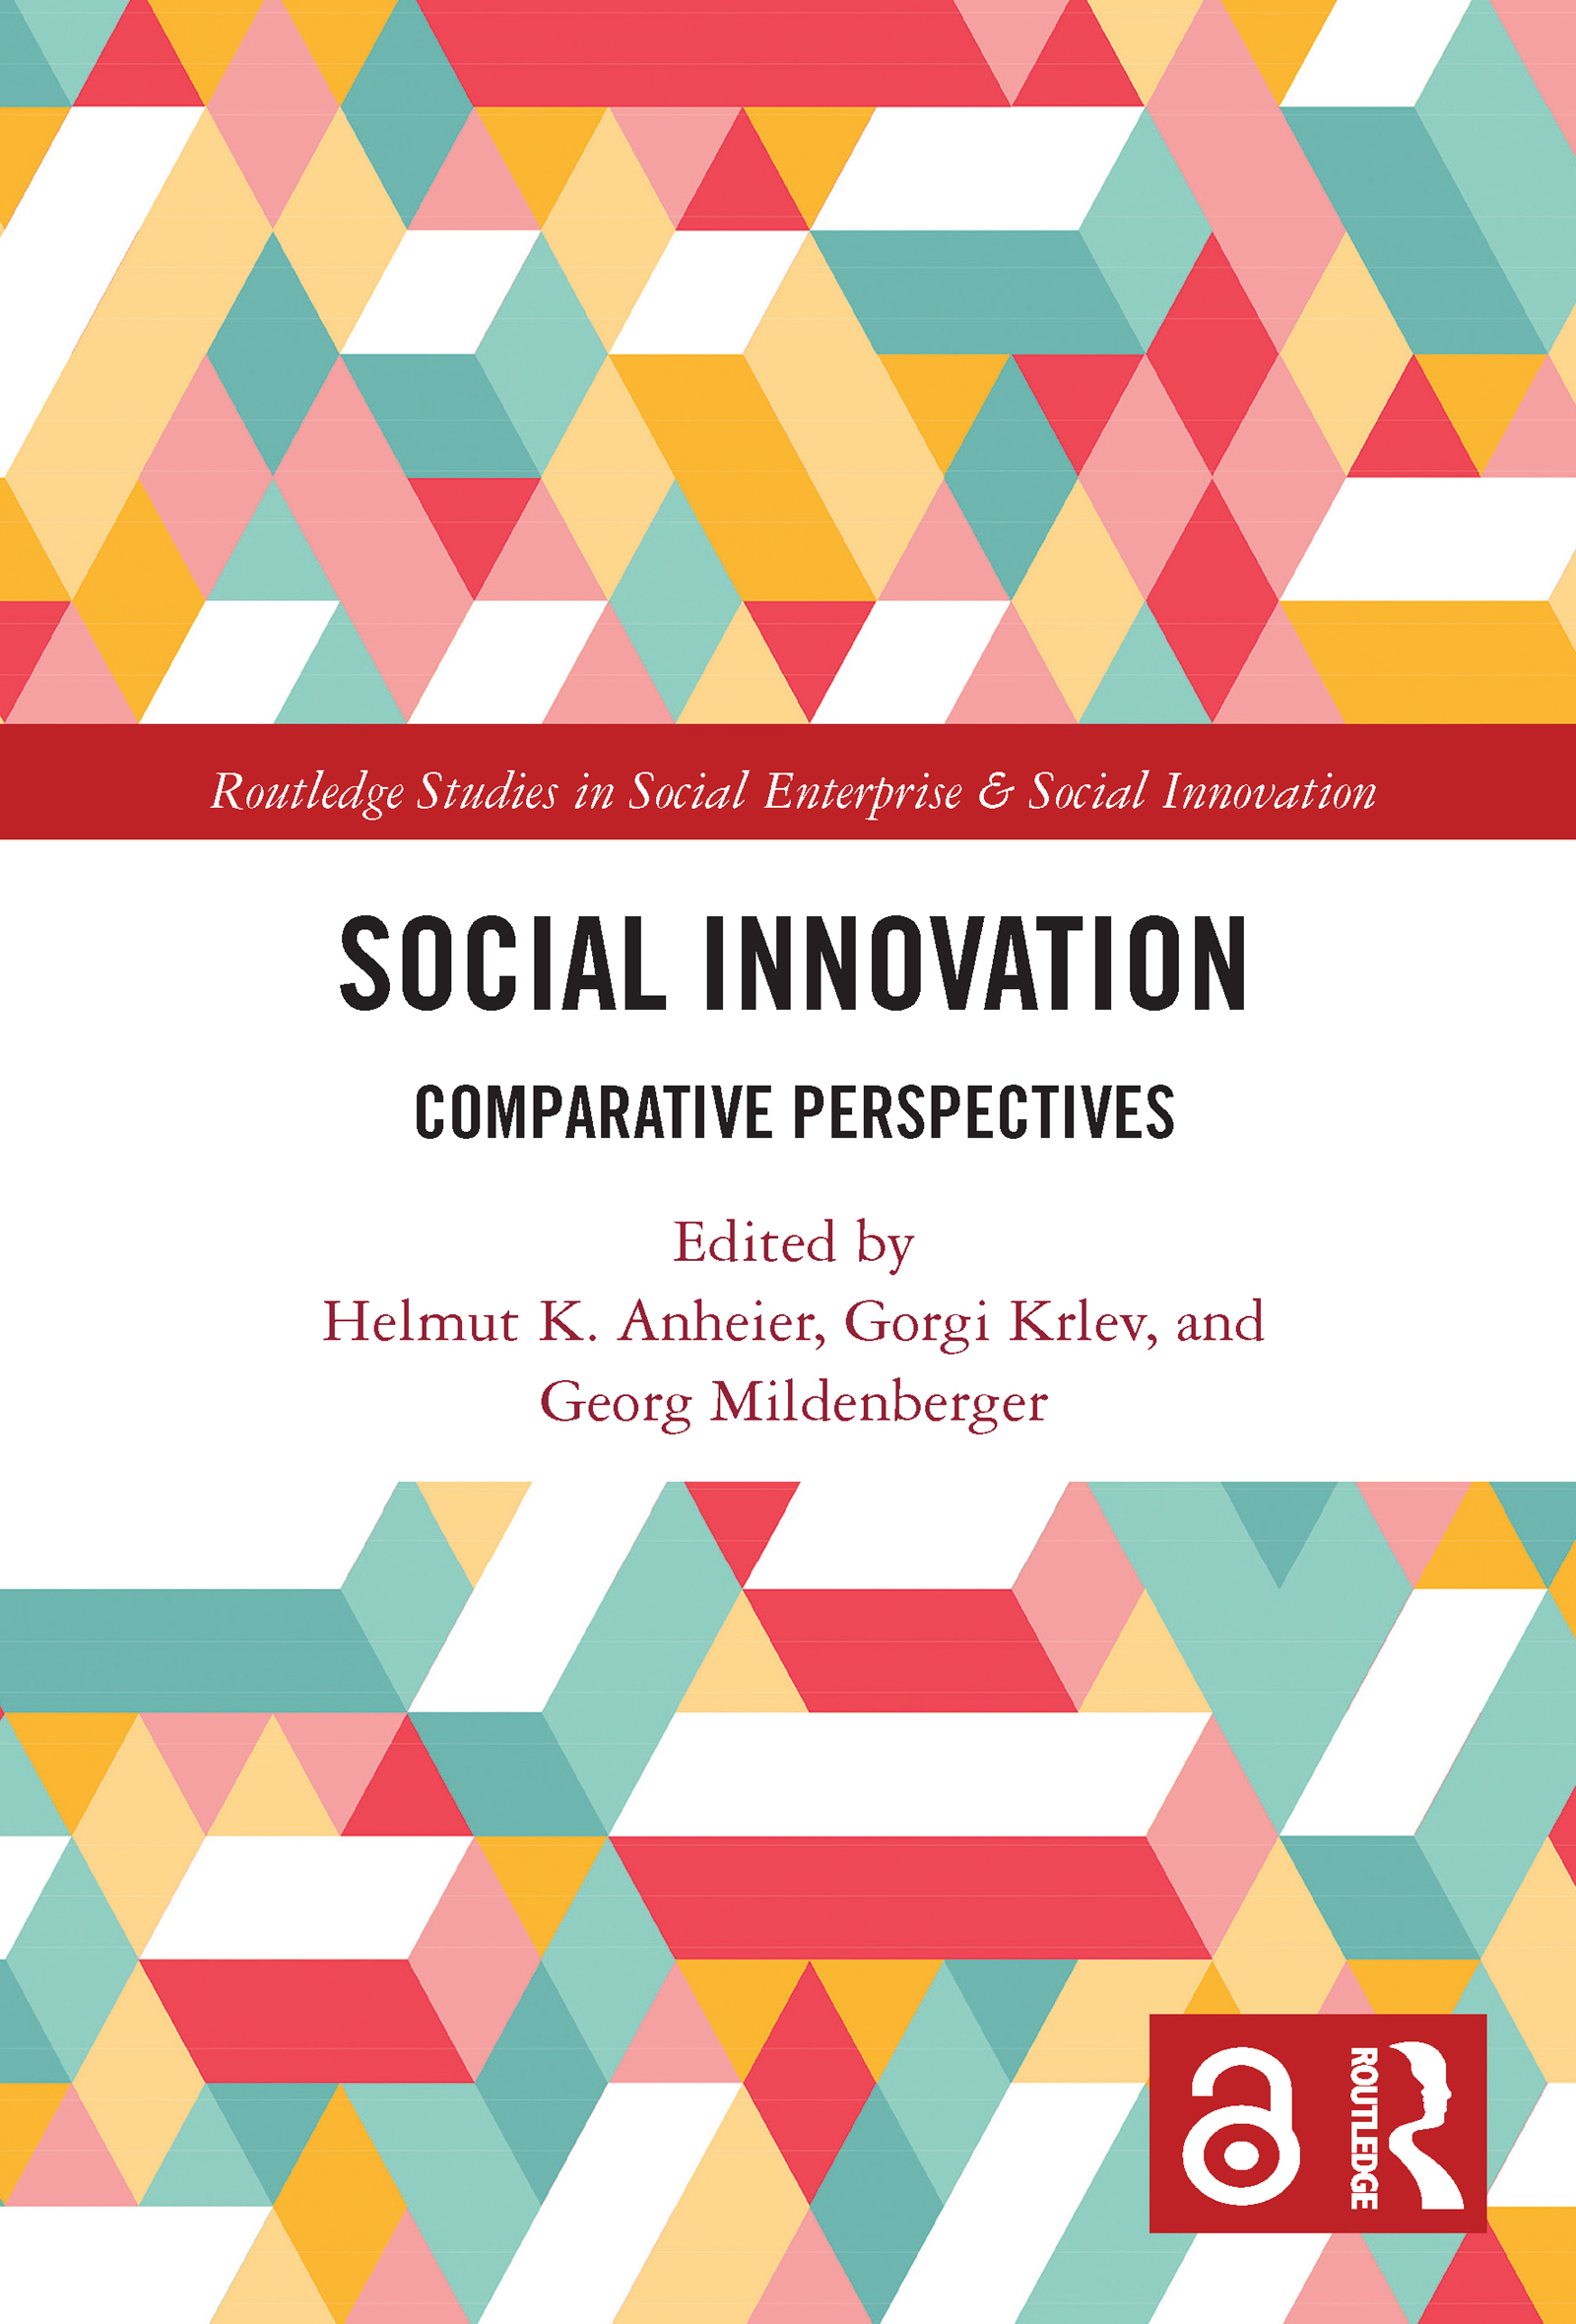 Social Innovation [Open Access]